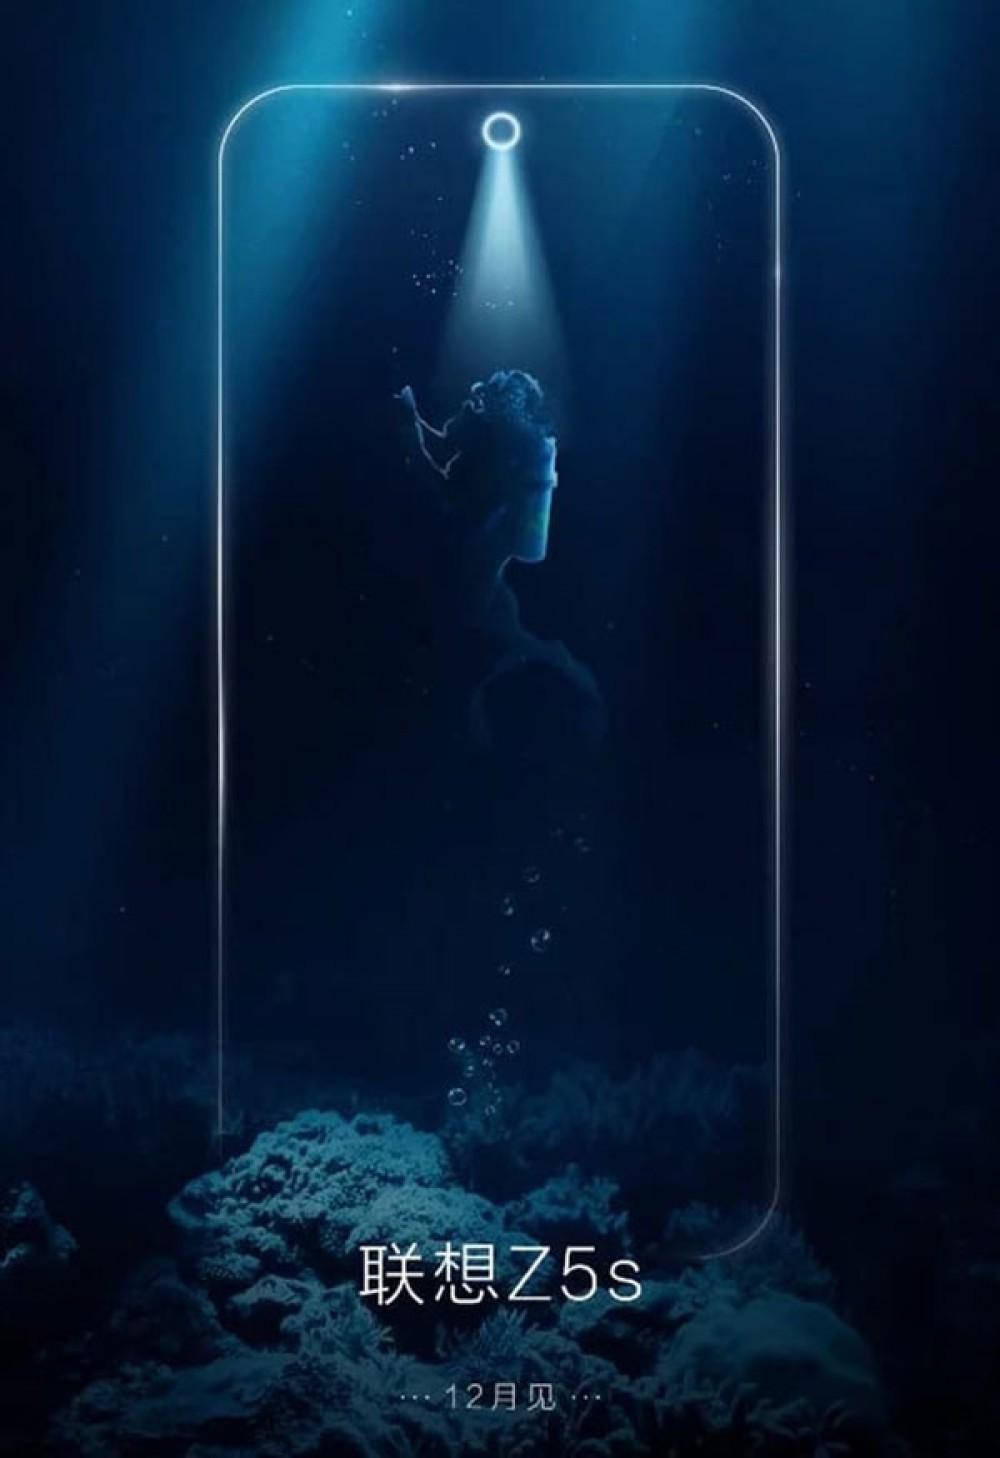 Lenovo Z5S: Επίσημο teaser αποκαλύπτει οπή στο κέντρο και παρουσίαση μέσα στο Δεκέμβριο